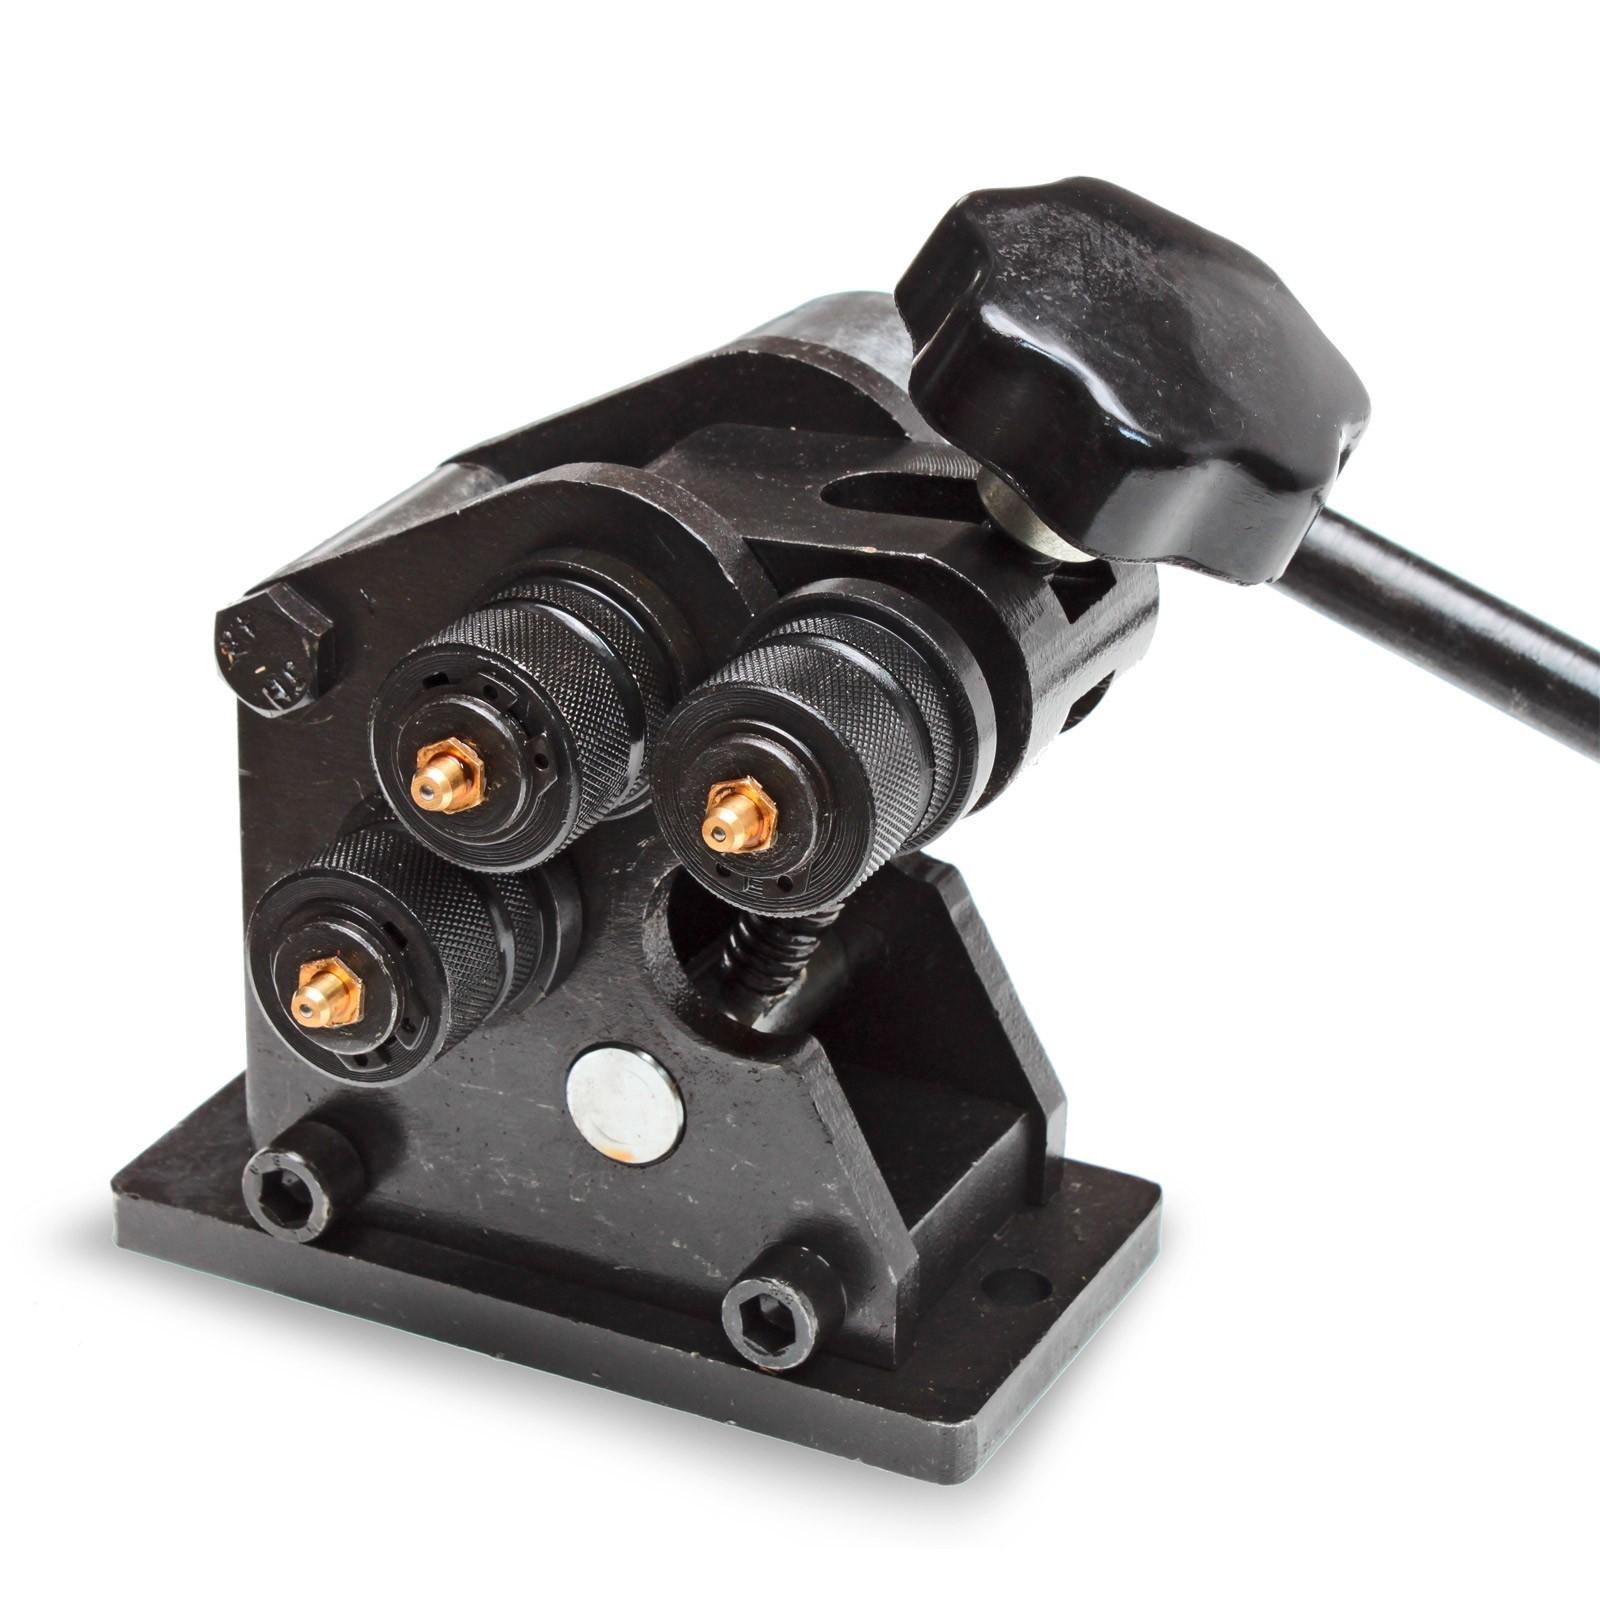 rollenbiegemaschine biegemaschine 5 7 mm. Black Bedroom Furniture Sets. Home Design Ideas